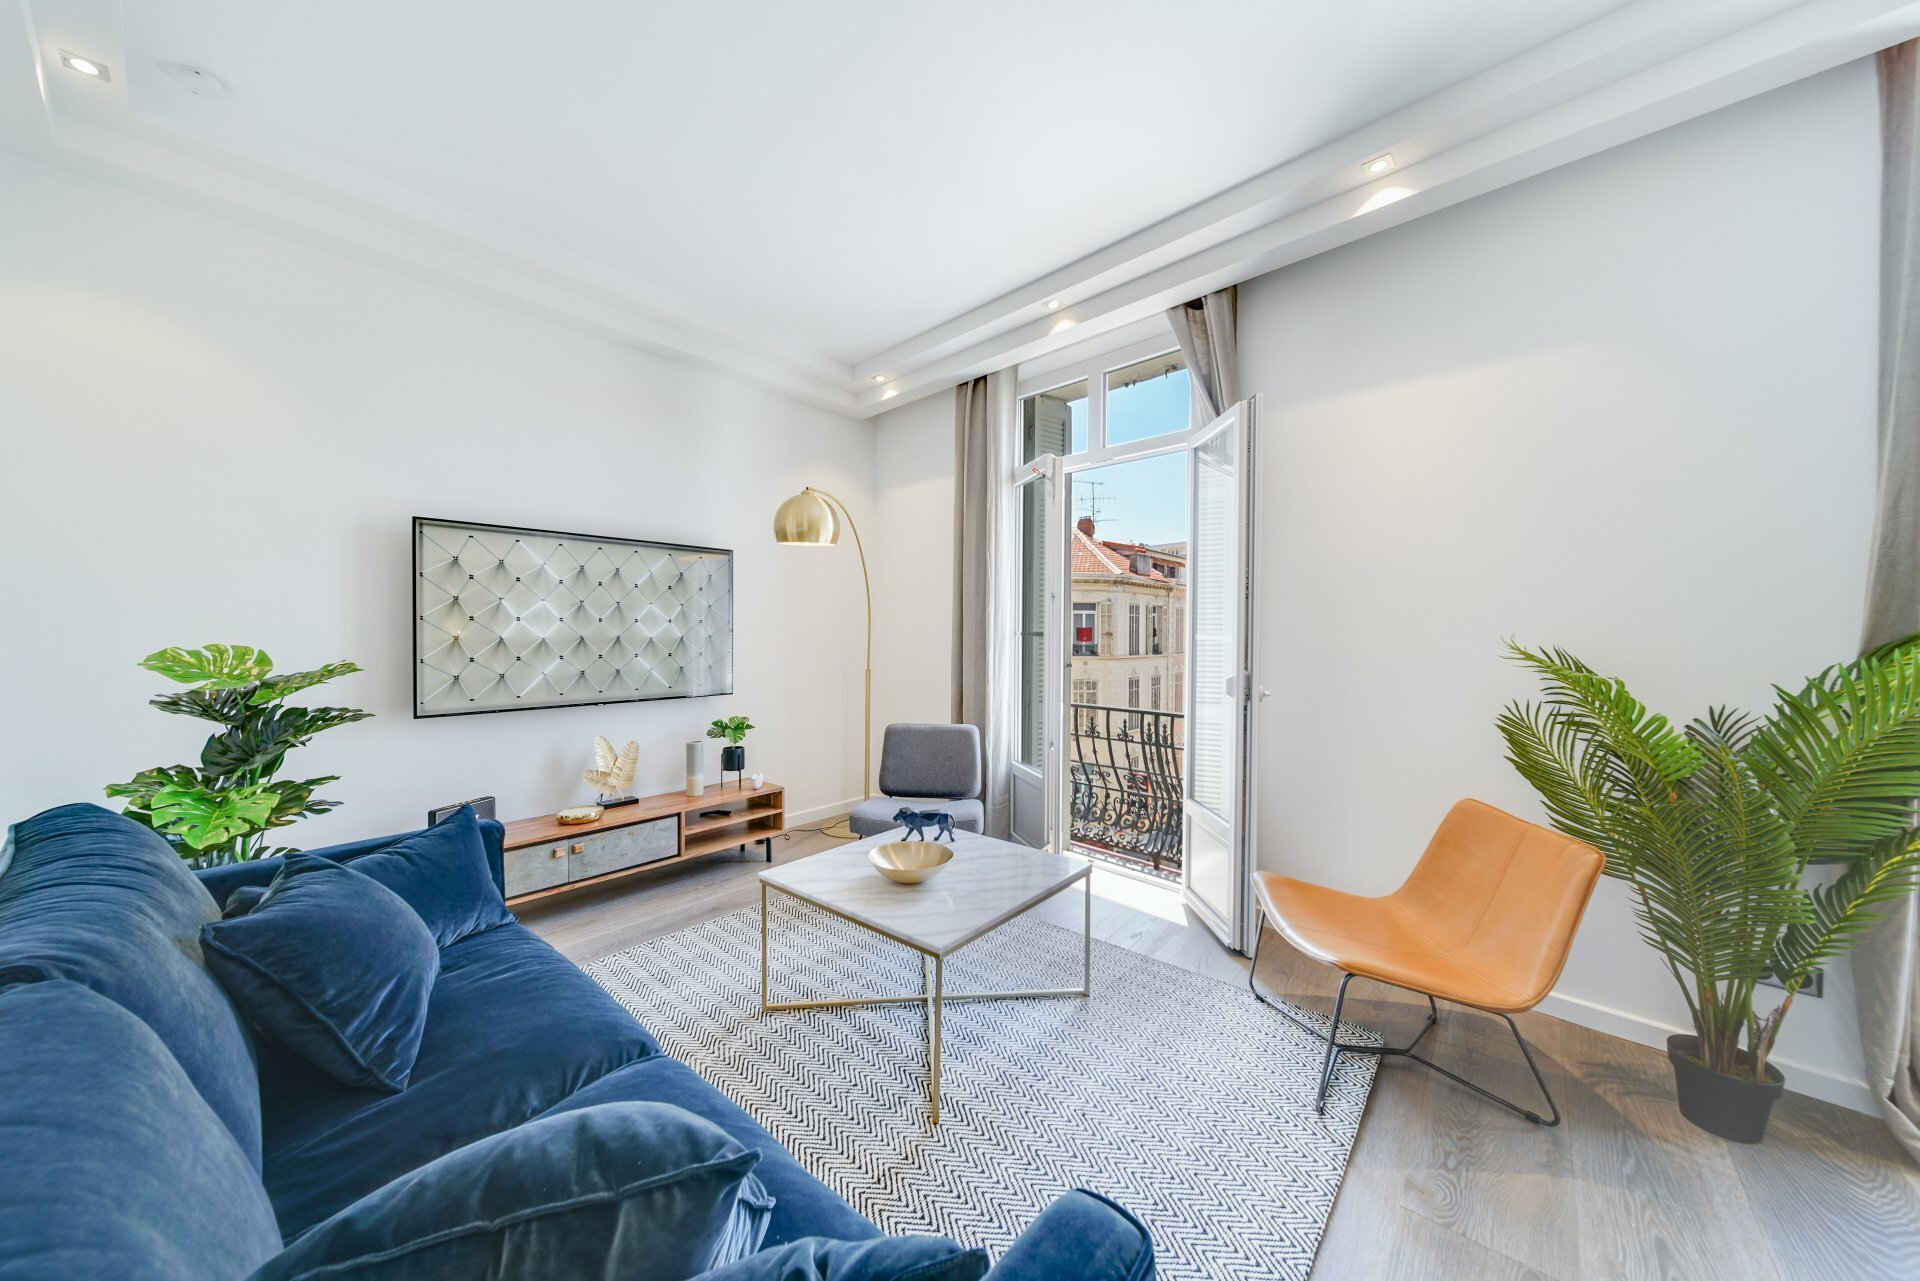 Apartment in Cannes, Provence-Alpes-Côte d'Azur, France 1 - 11343653